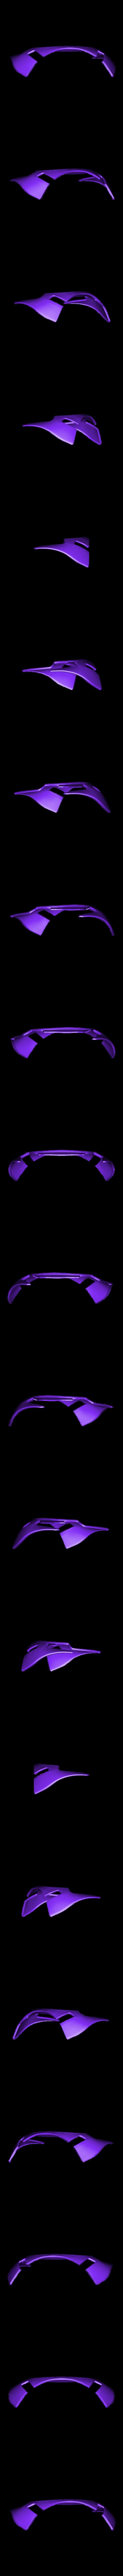 Lucio_body_top.stl Download free STL file Overwatch Lucio Blaster • 3D printer object, Adafruit